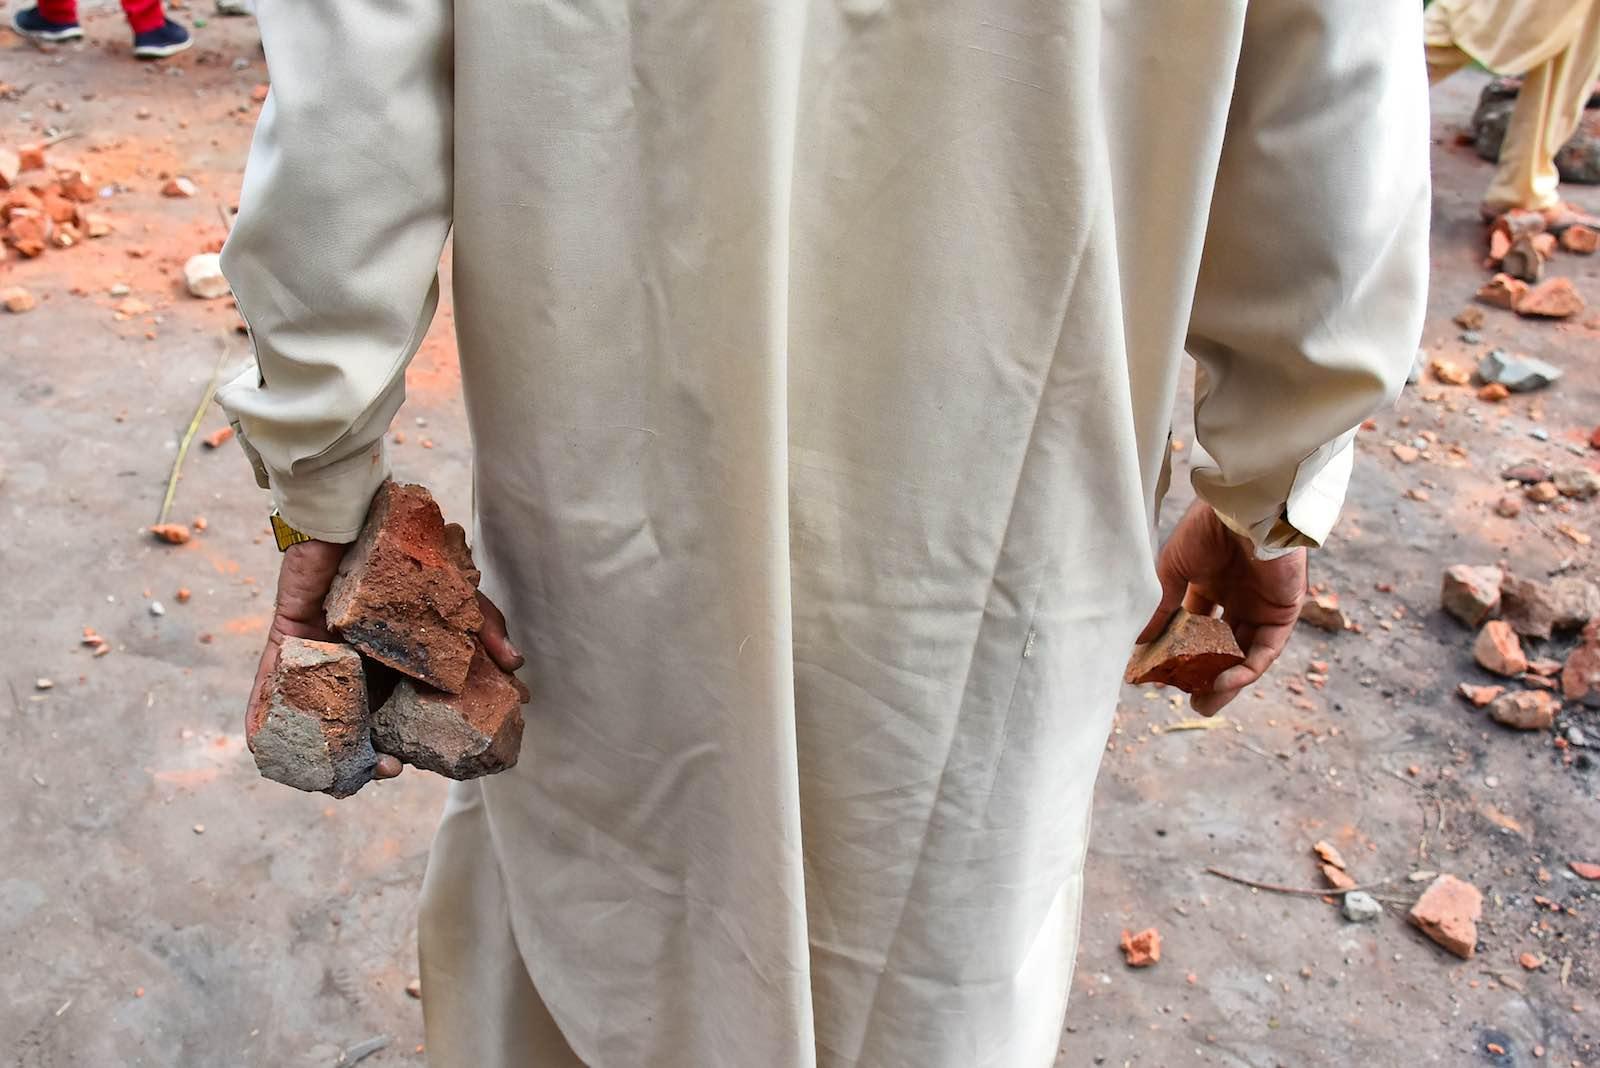 Gathering stones during clashes between demonstrators and Indian authorities in Srinagar (Photo: Muzamil Mattoo/NurPhoto via Getty)